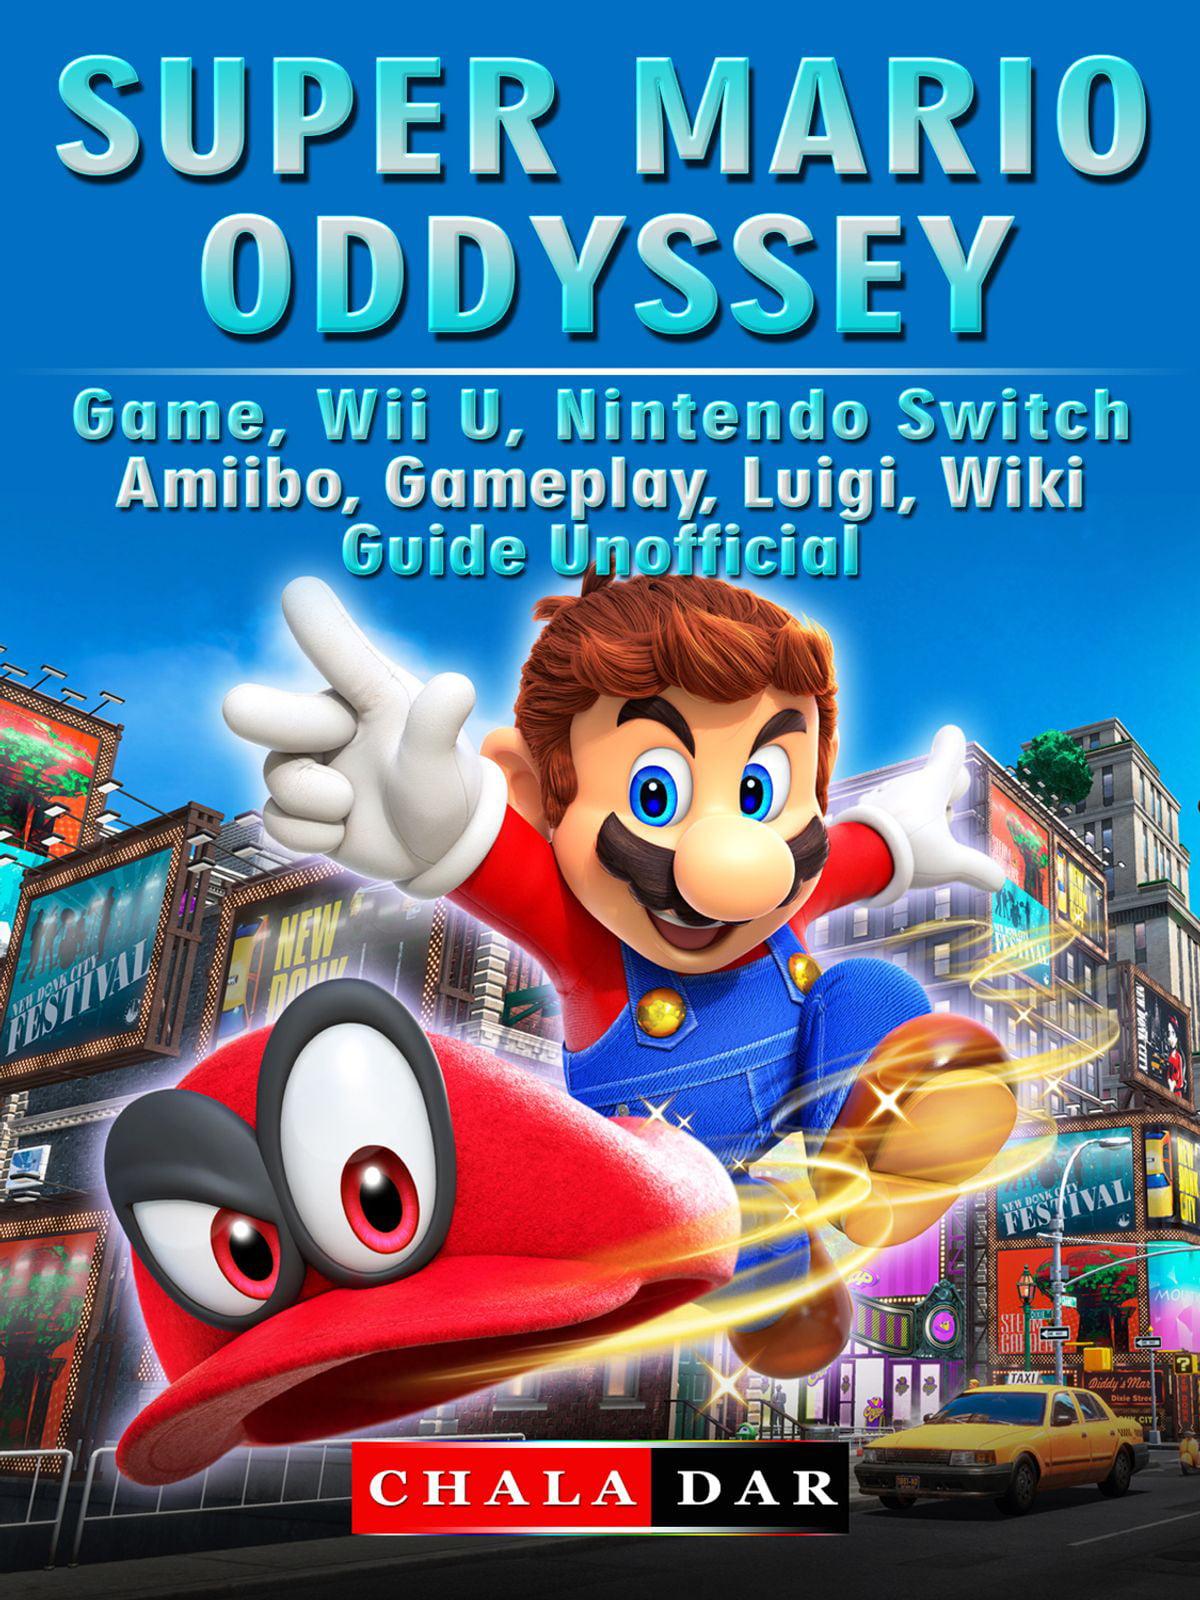 Super Mario Odyssey Game Wii U Nintendo Switch Amiibo Gameplay Luigi Wiki Guide Unofficial Ebook Walmart Com